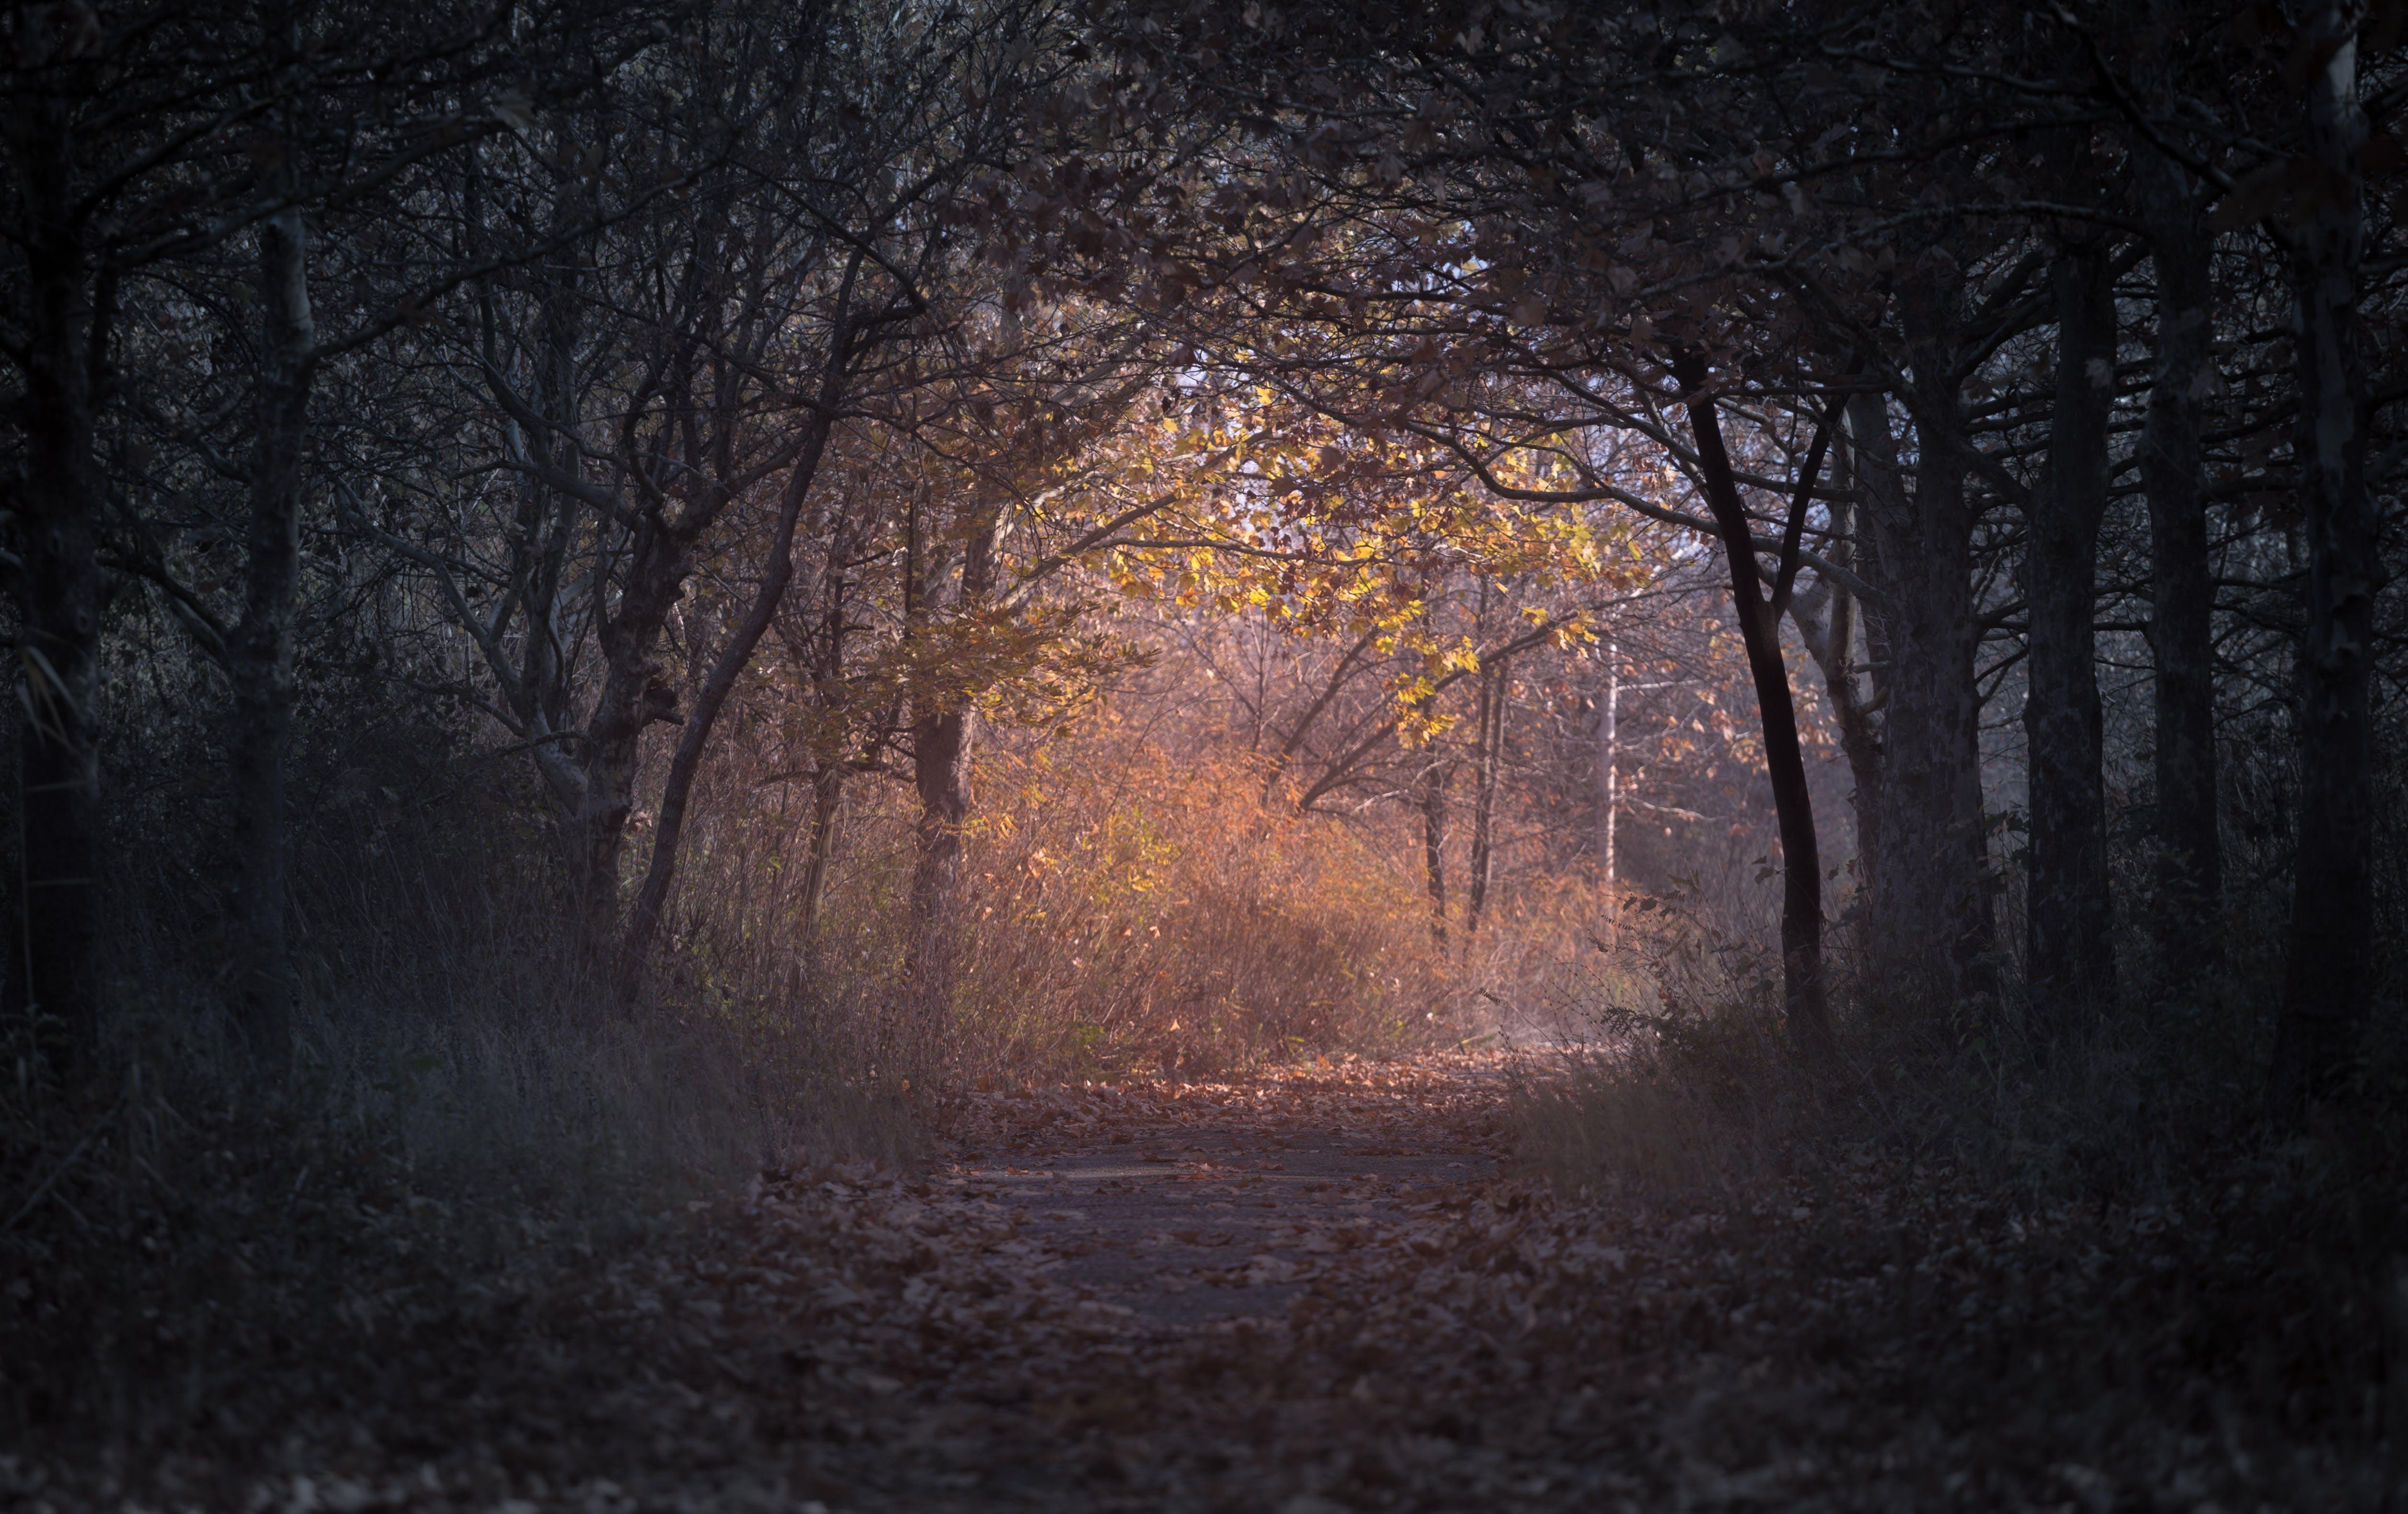 Kostenloses Stock Foto zu ast, bäume, dunkel, getrocknete blätter